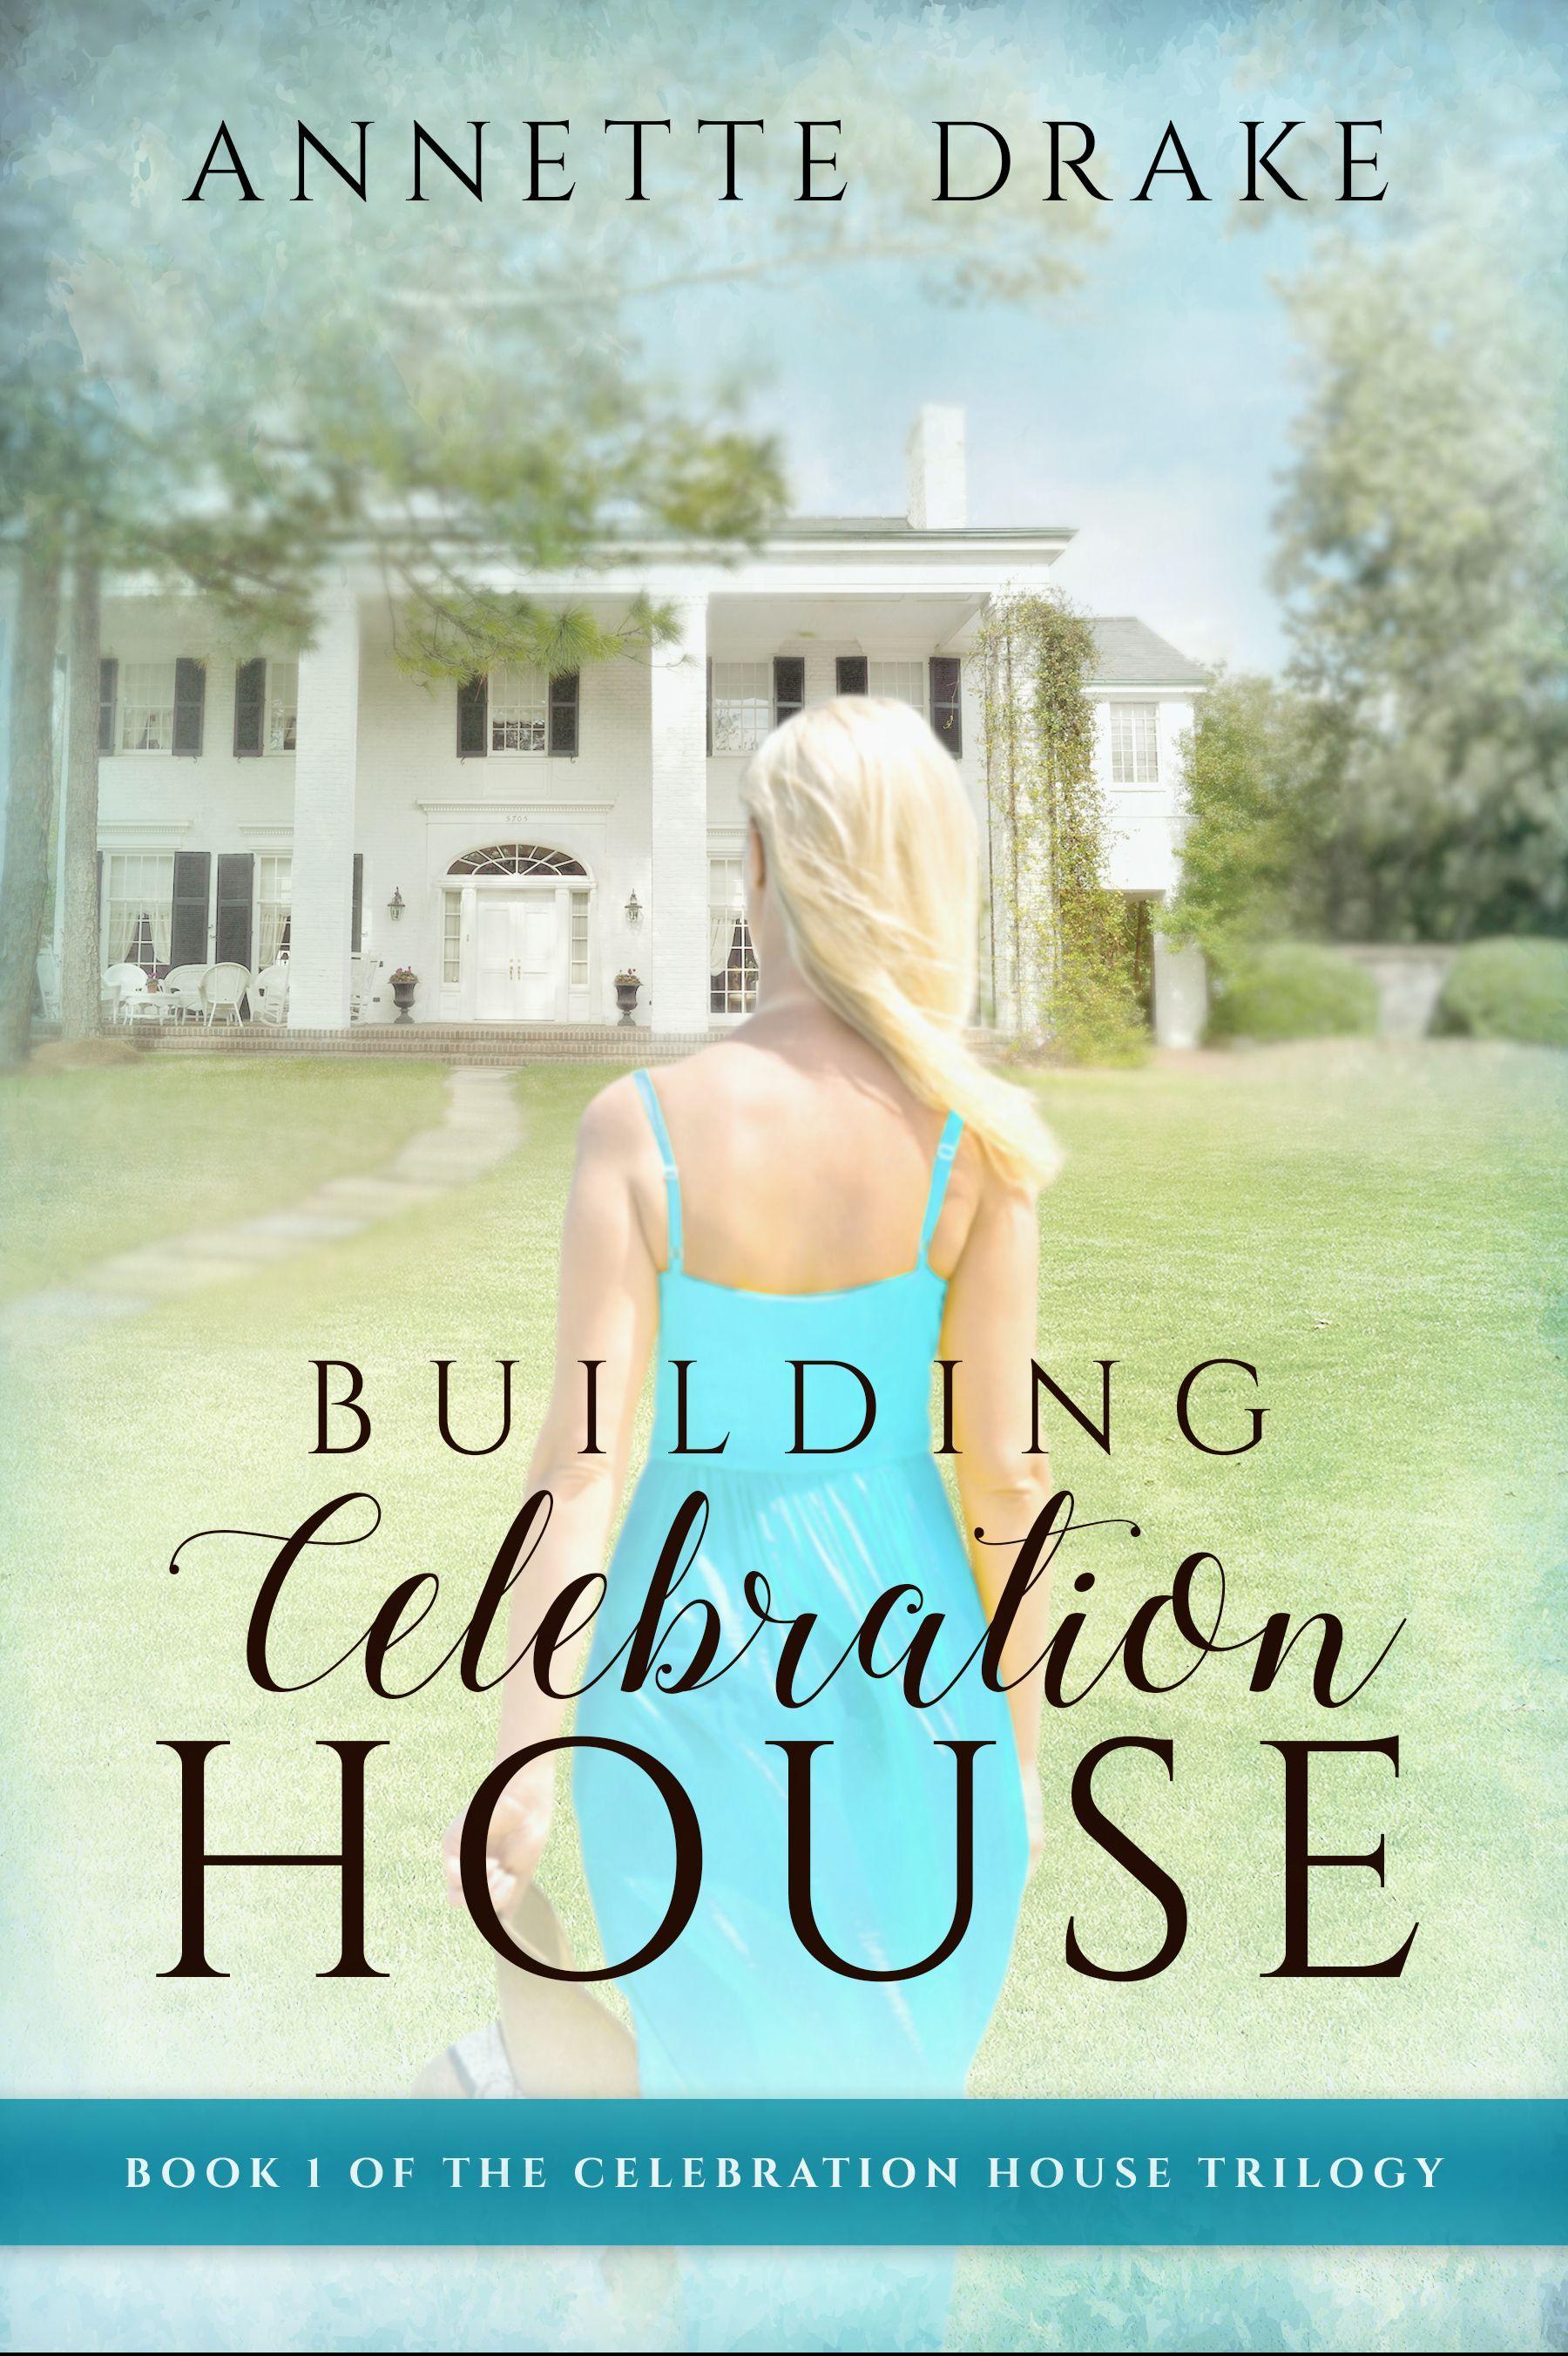 CelebrationHouse_Book1